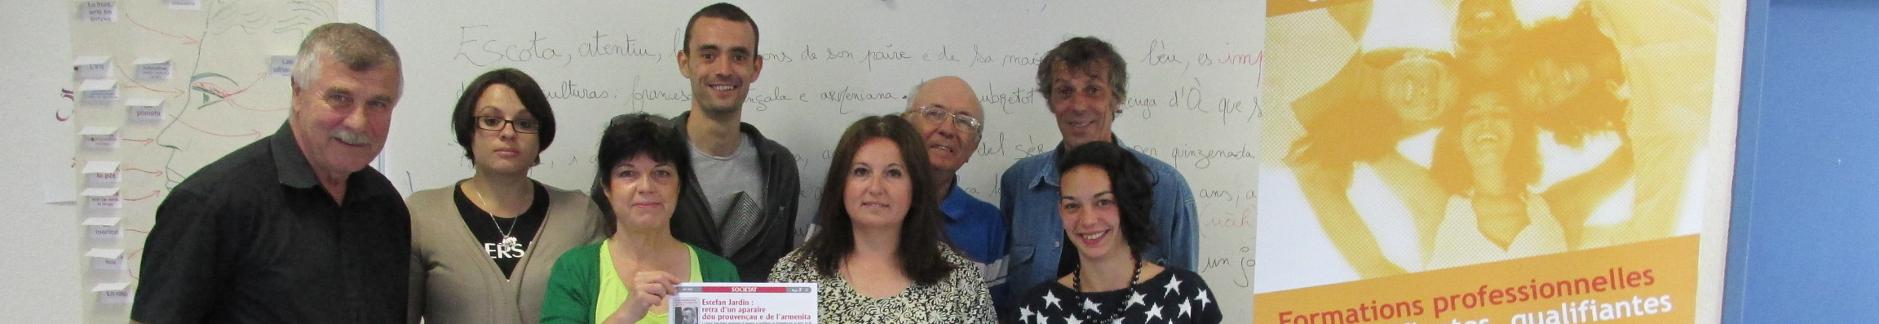 bandeau-logo-ff-2014-2015